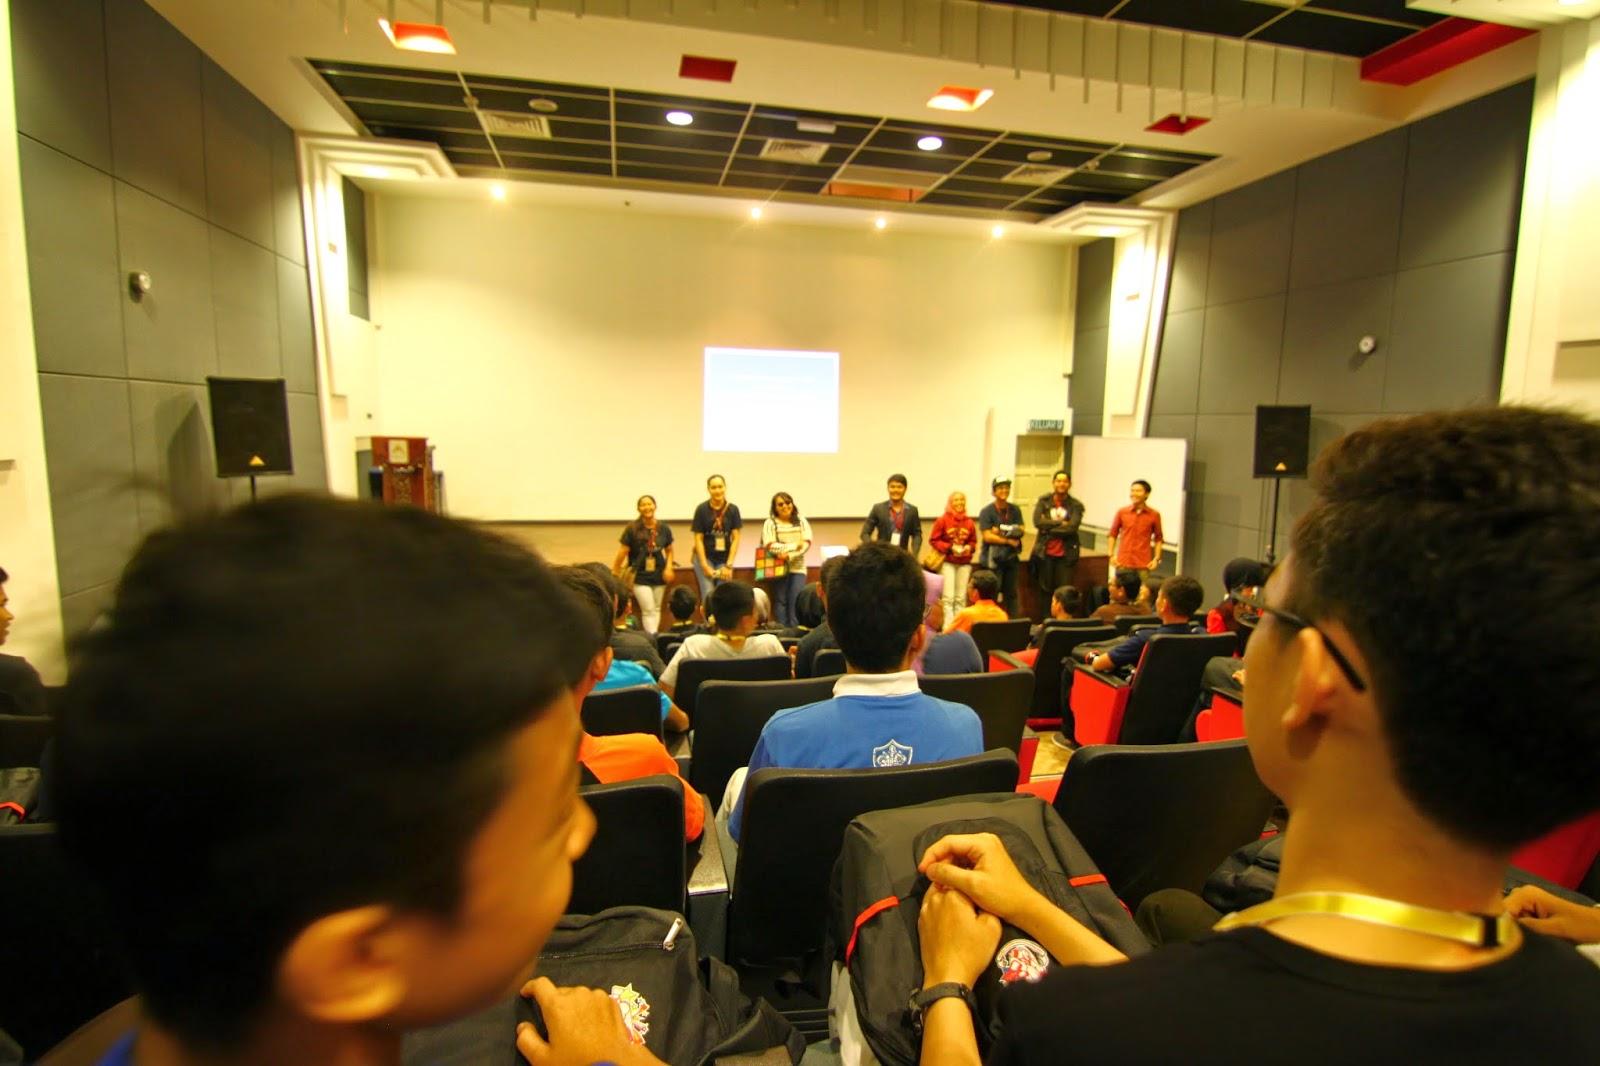 Sesi pitching kem pembangunan remaja kreatif di ASWARA